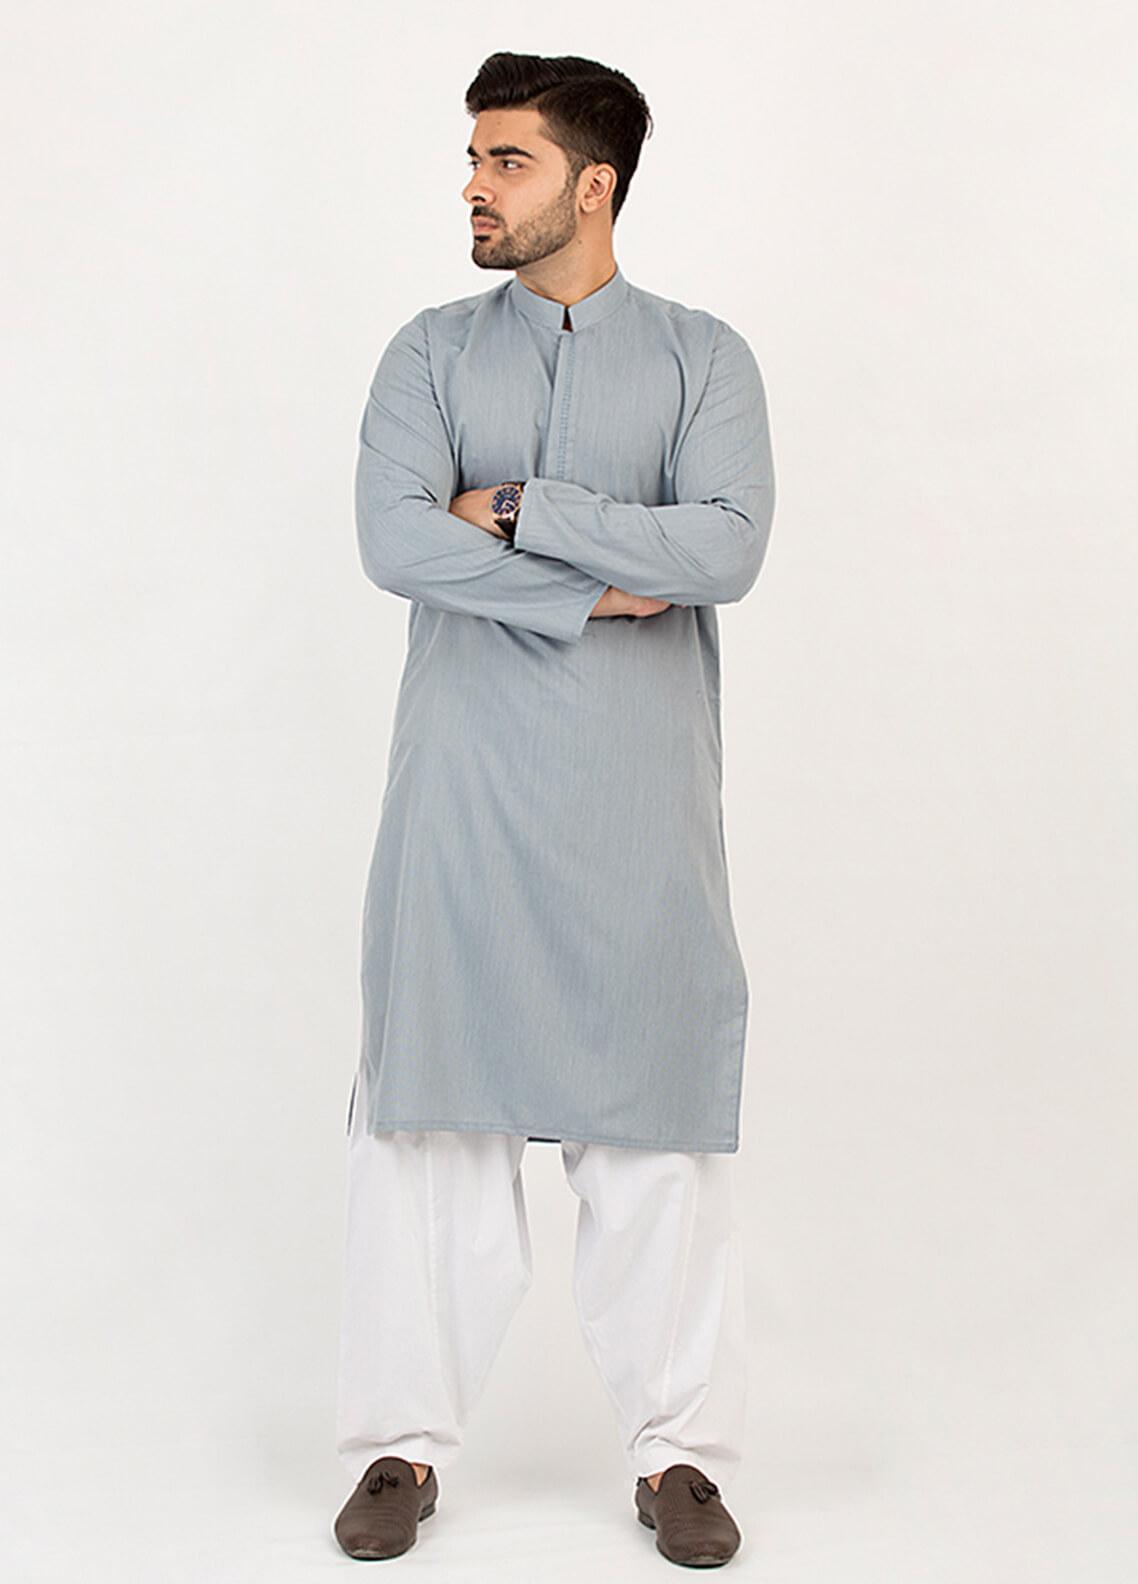 Shahzeb Saeed Wash N Wear Formal Kurta for Men - Grey KURTA-96